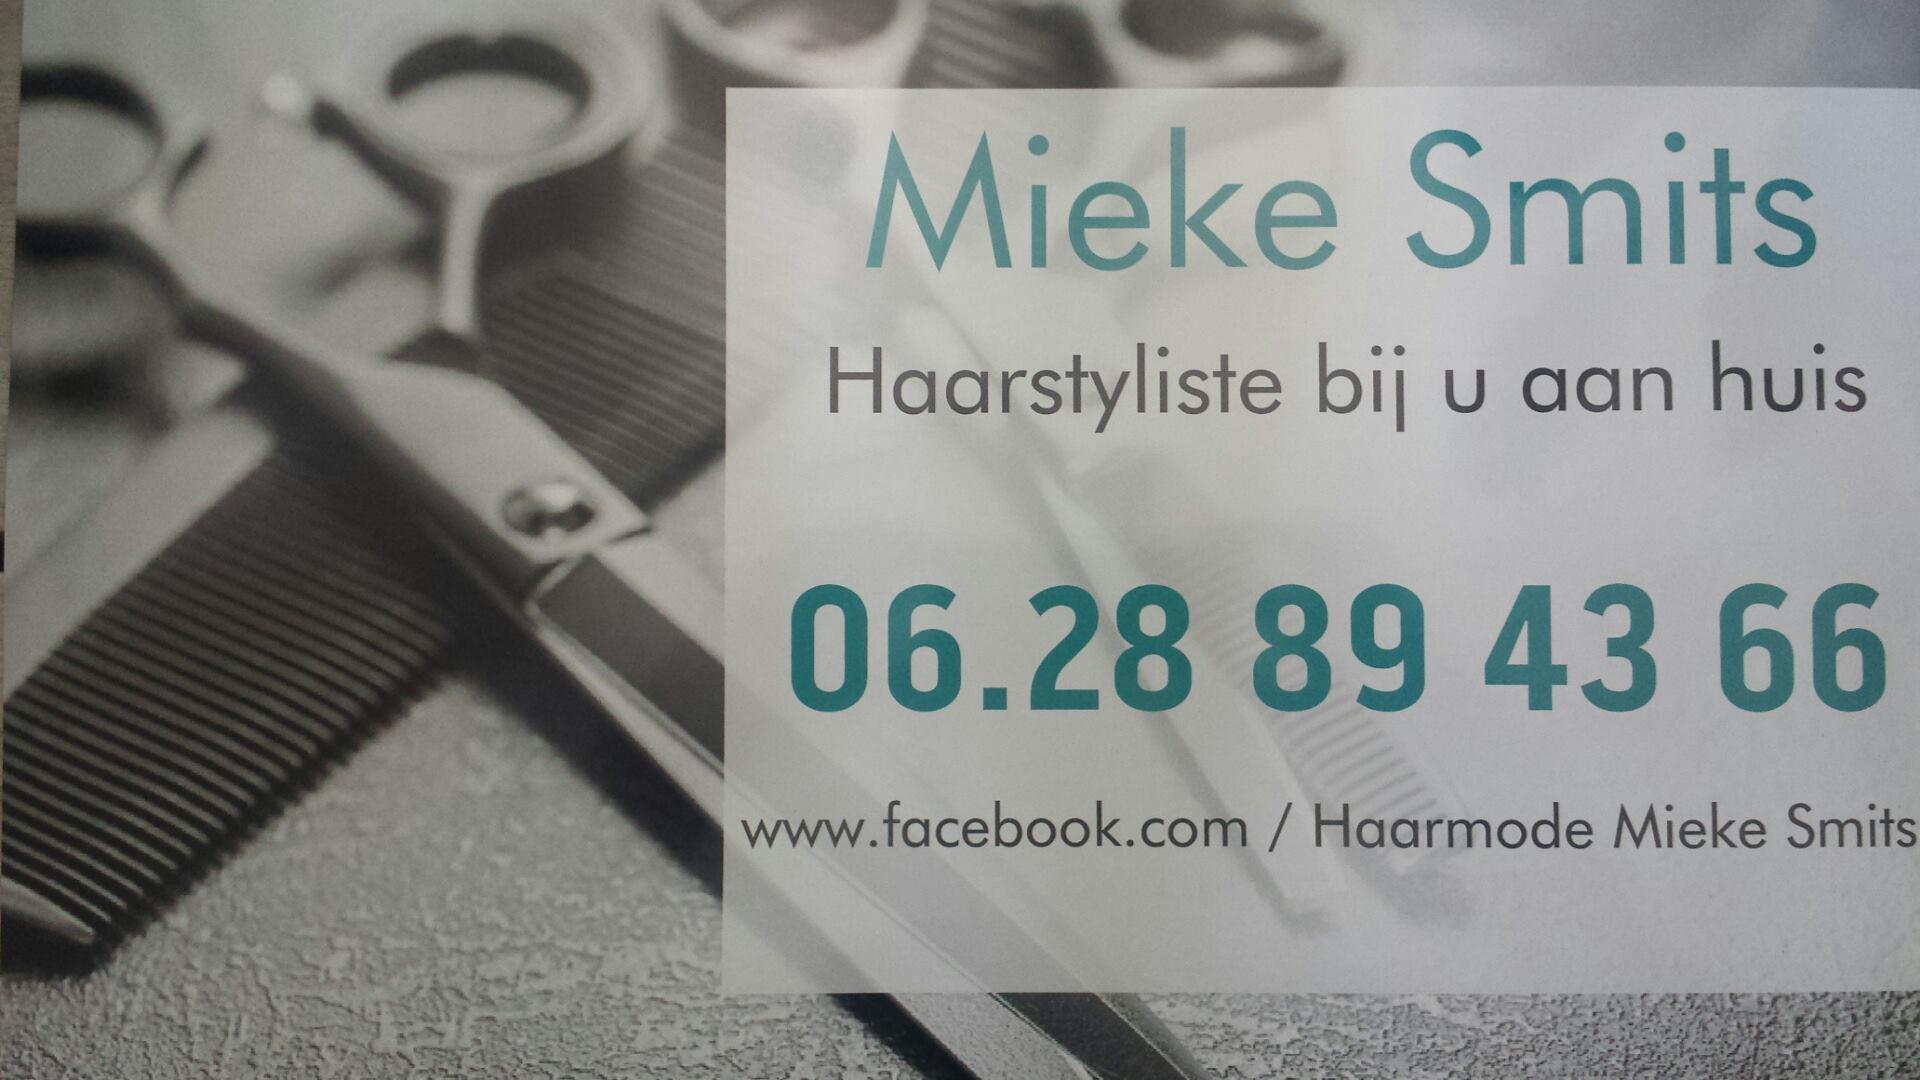 Mieke Smits